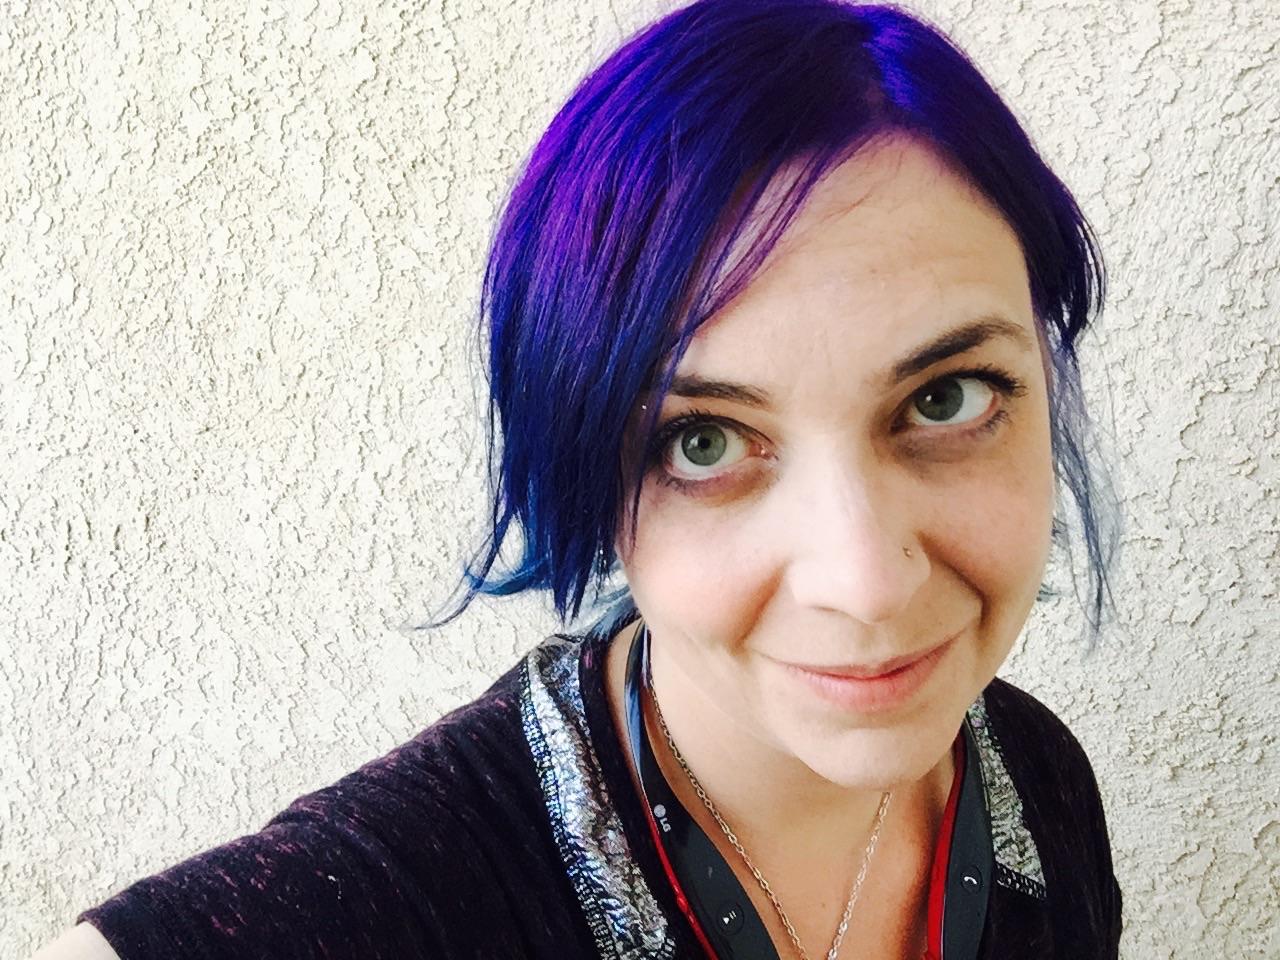 purple hair pic.jpg